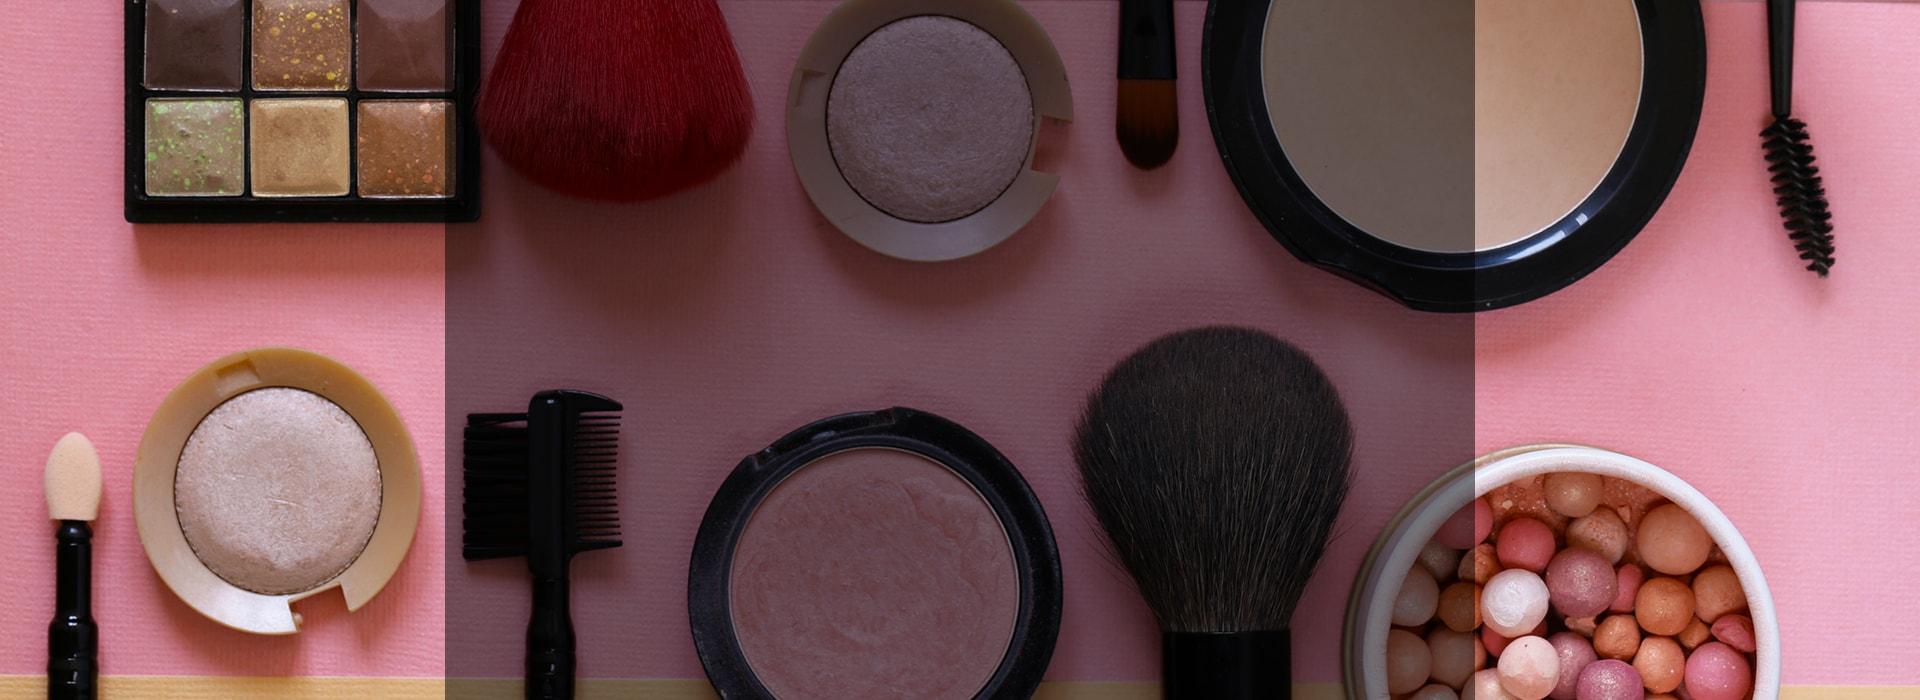 vente-cosmetique-bruxelles